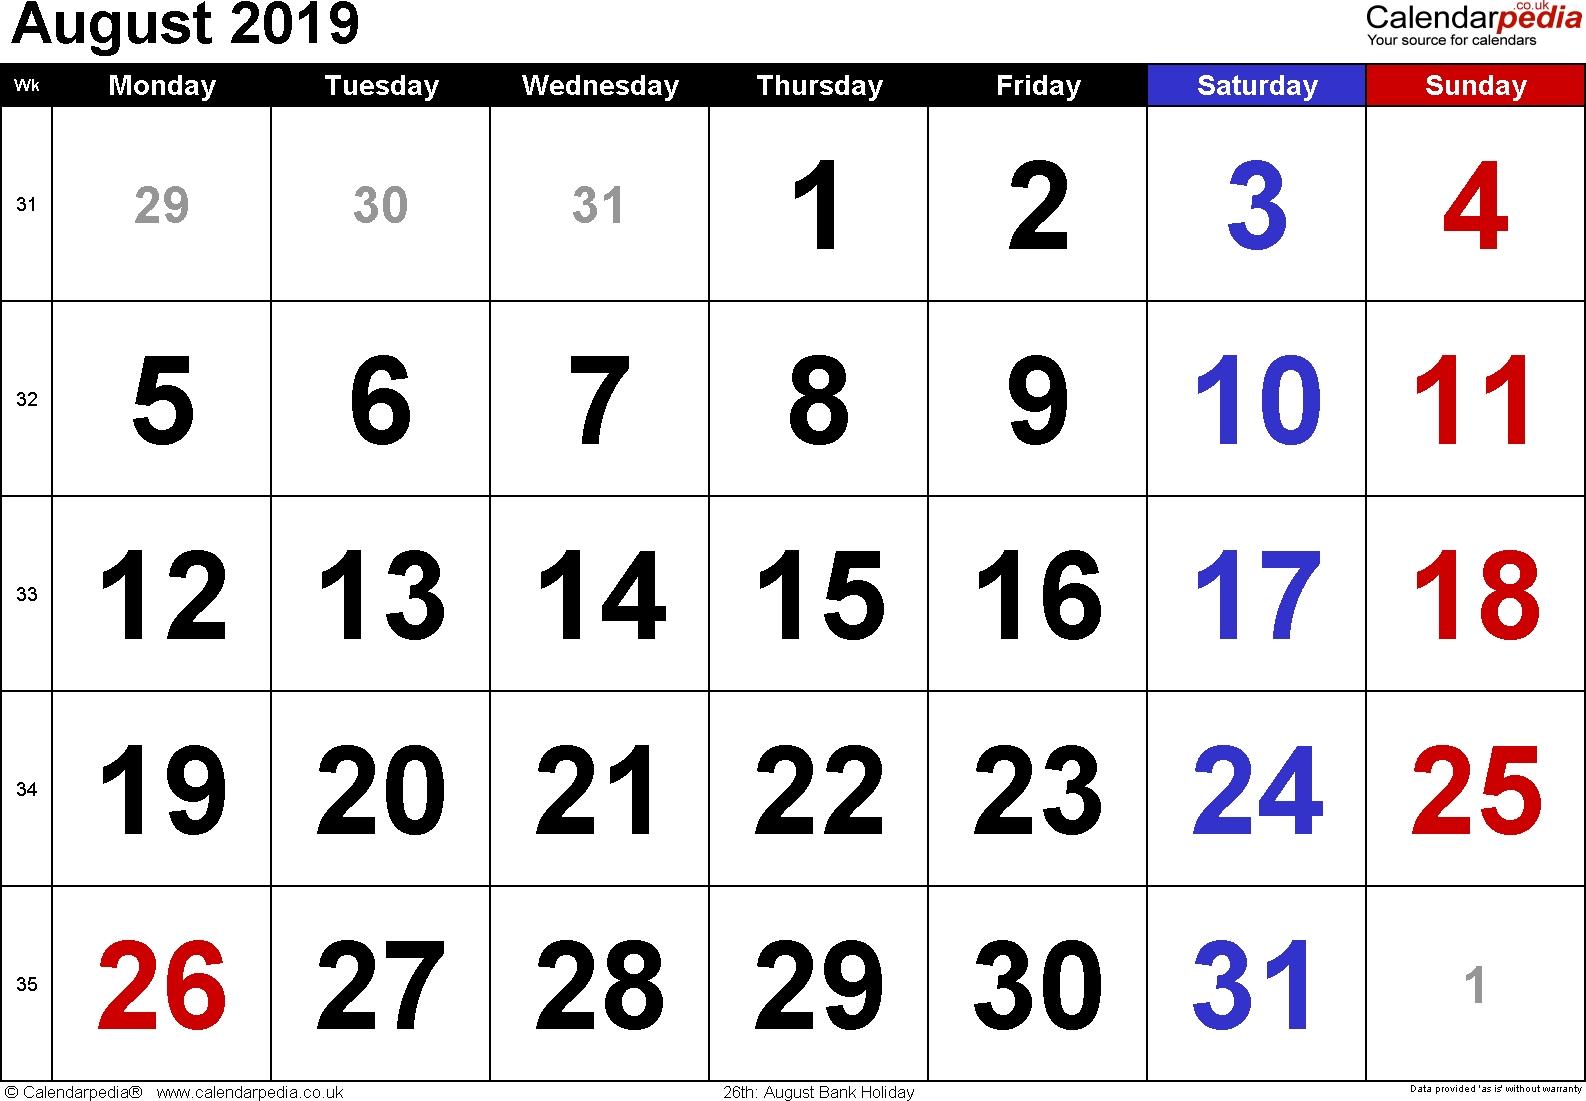 Calendar August 2019 Uk, Bank Holidays, Excel/pdf/word Templates 8 August 2019 Calendar